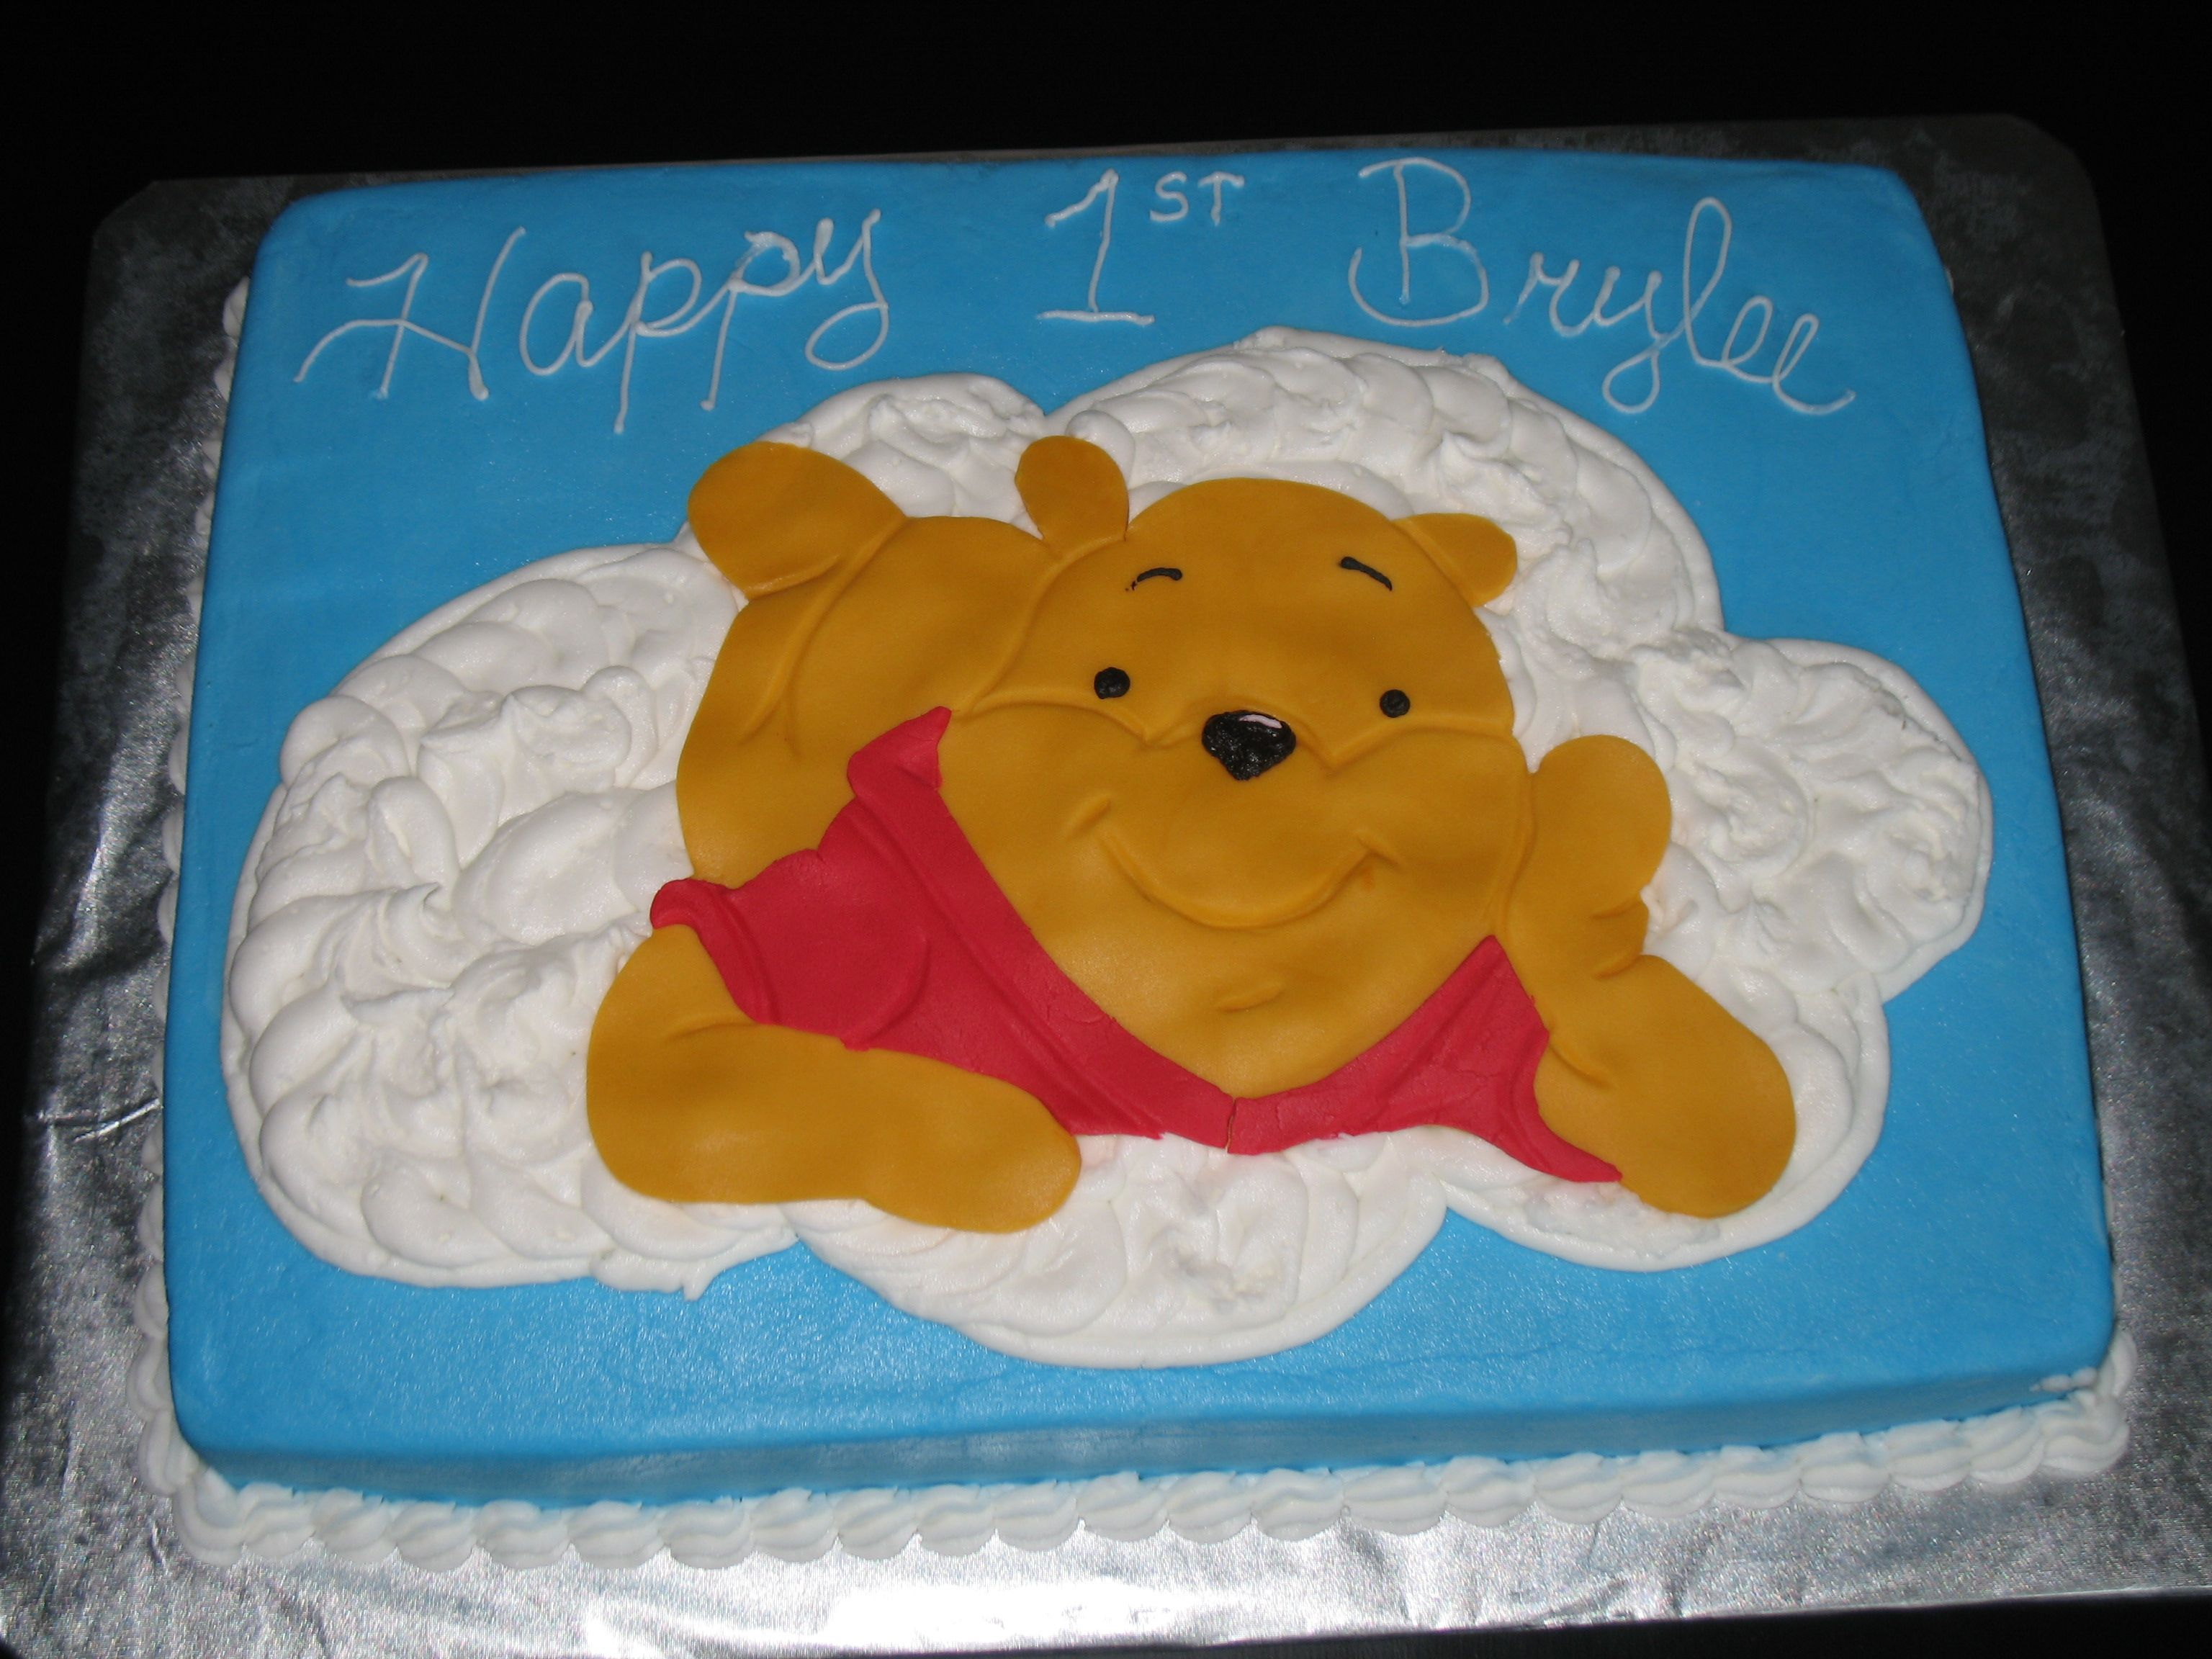 Pooh Birthday Cake Design : Pooh 1st Birthday! Kids 1st Birthday Cake Designs ...